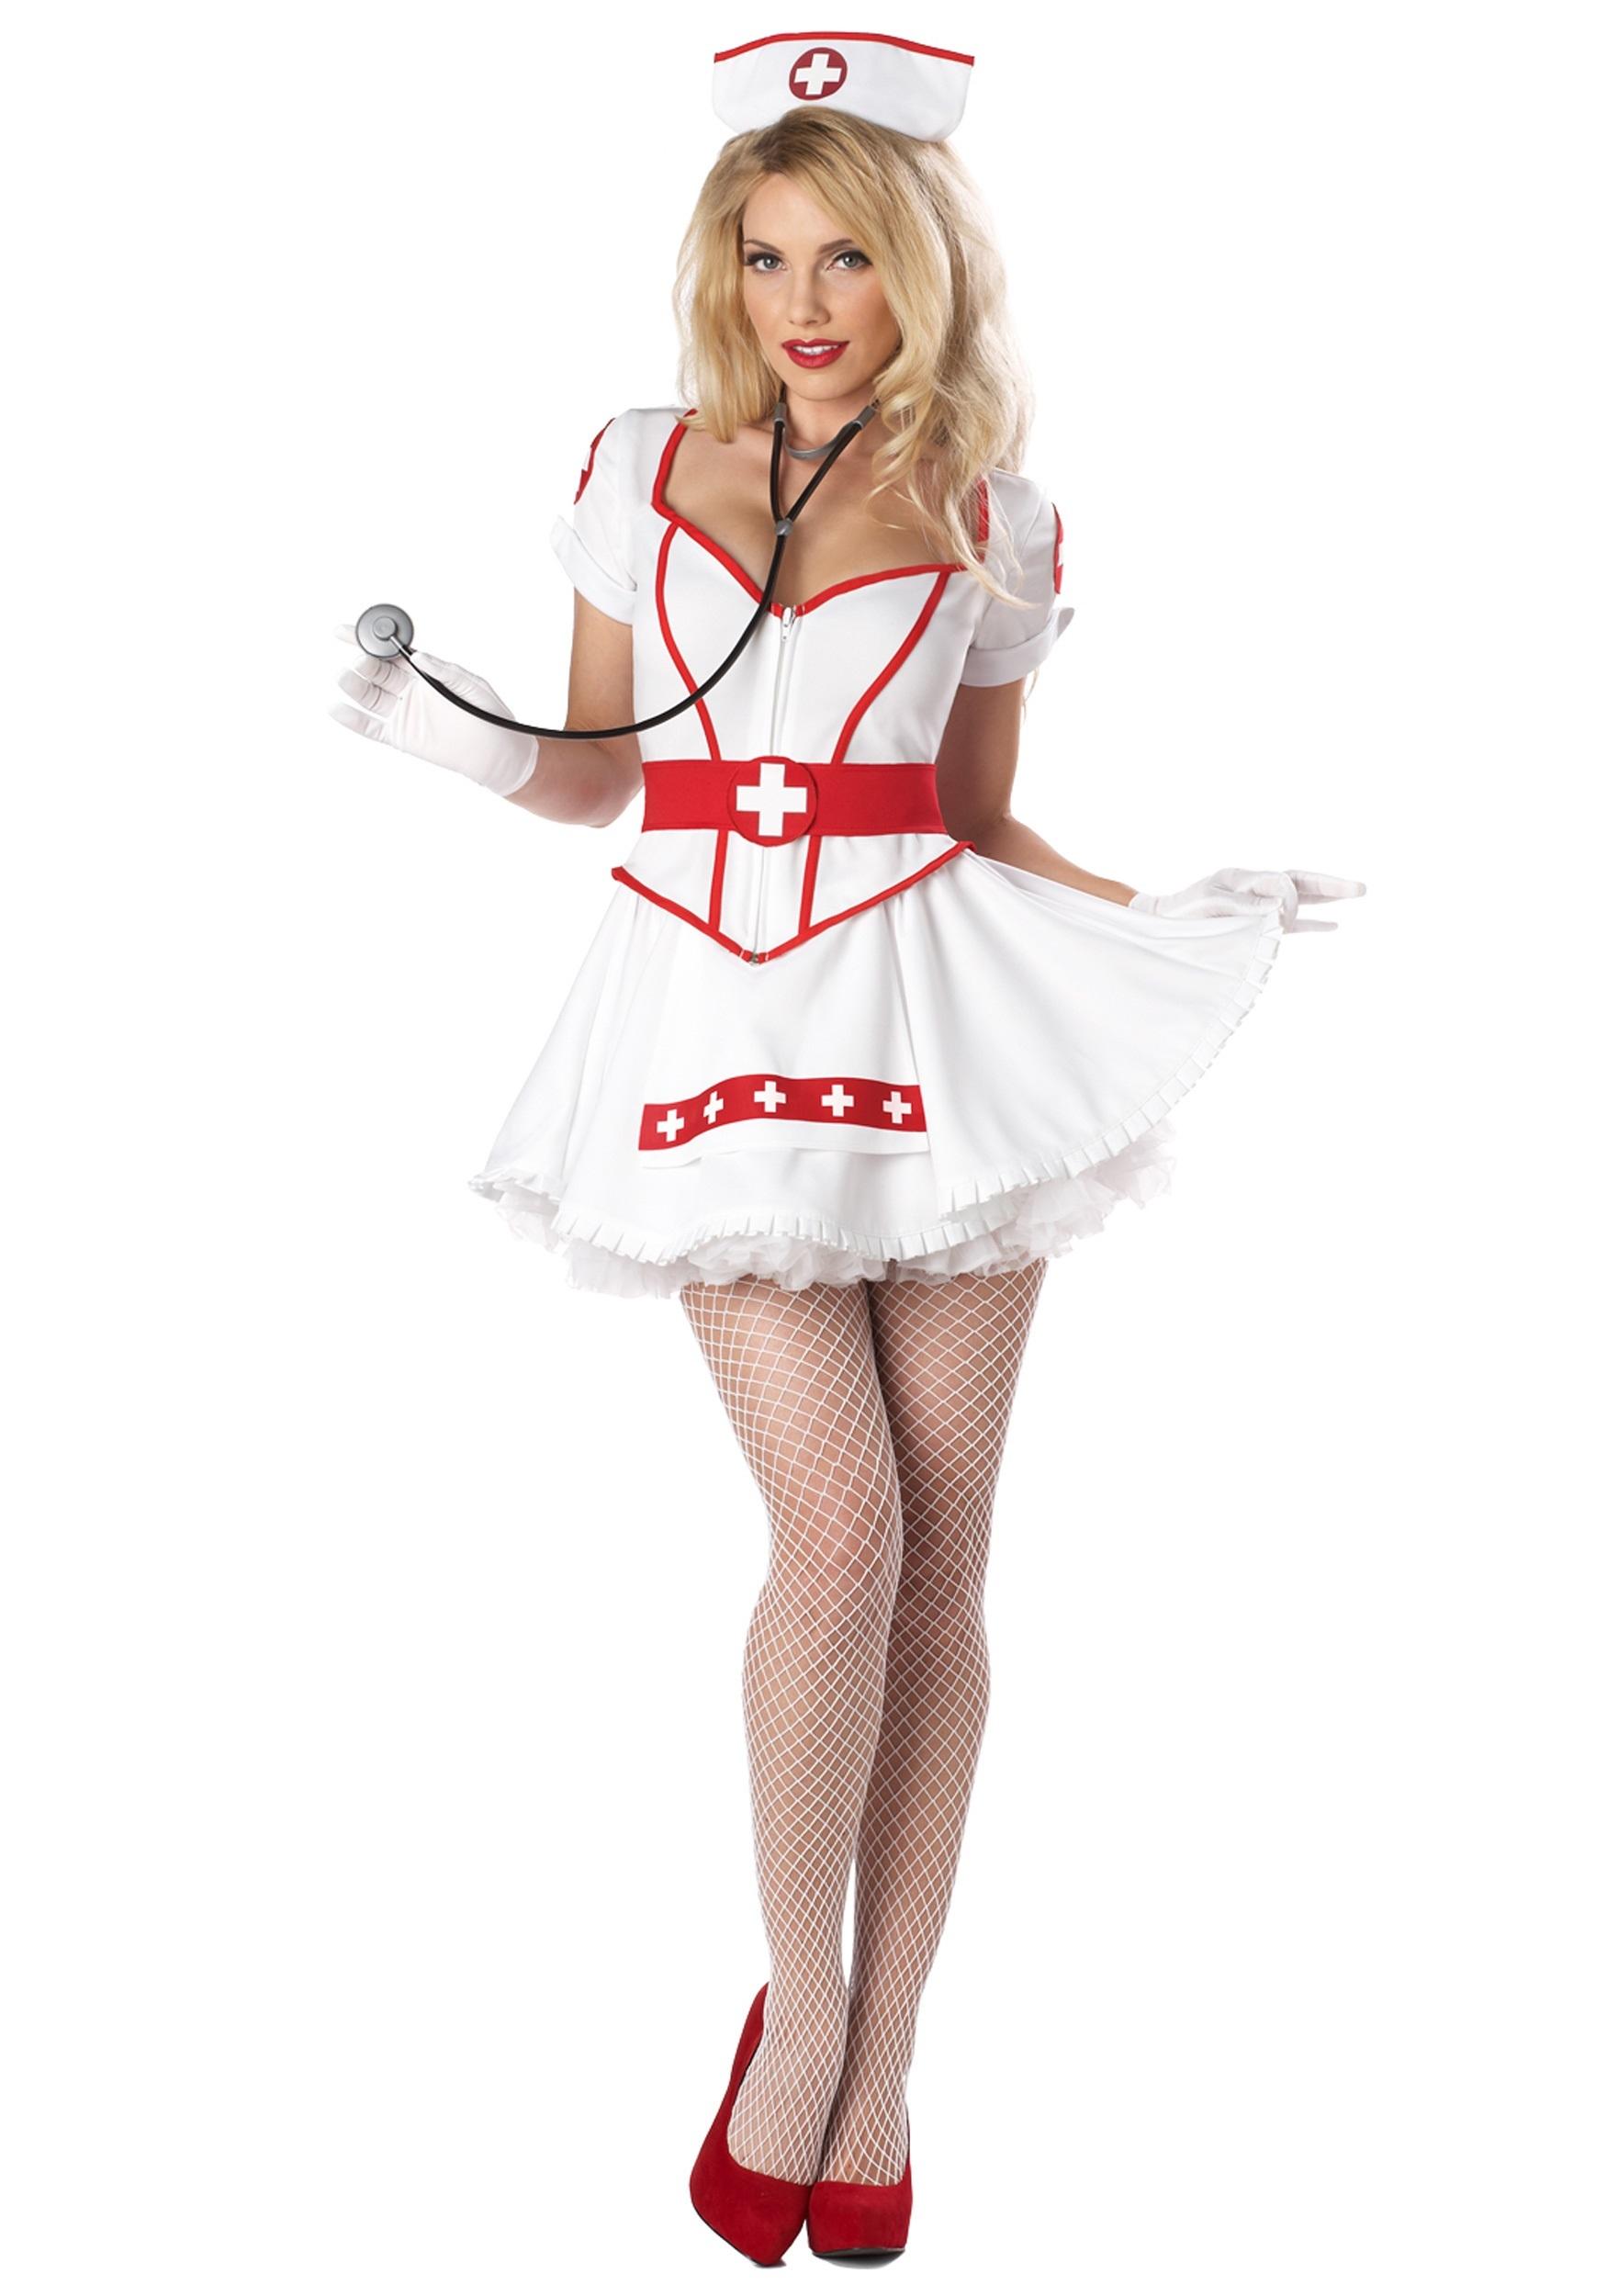 Women Nurse Uniform Costume Women Nurse Uniform Funny Christmas Cosplay Costume